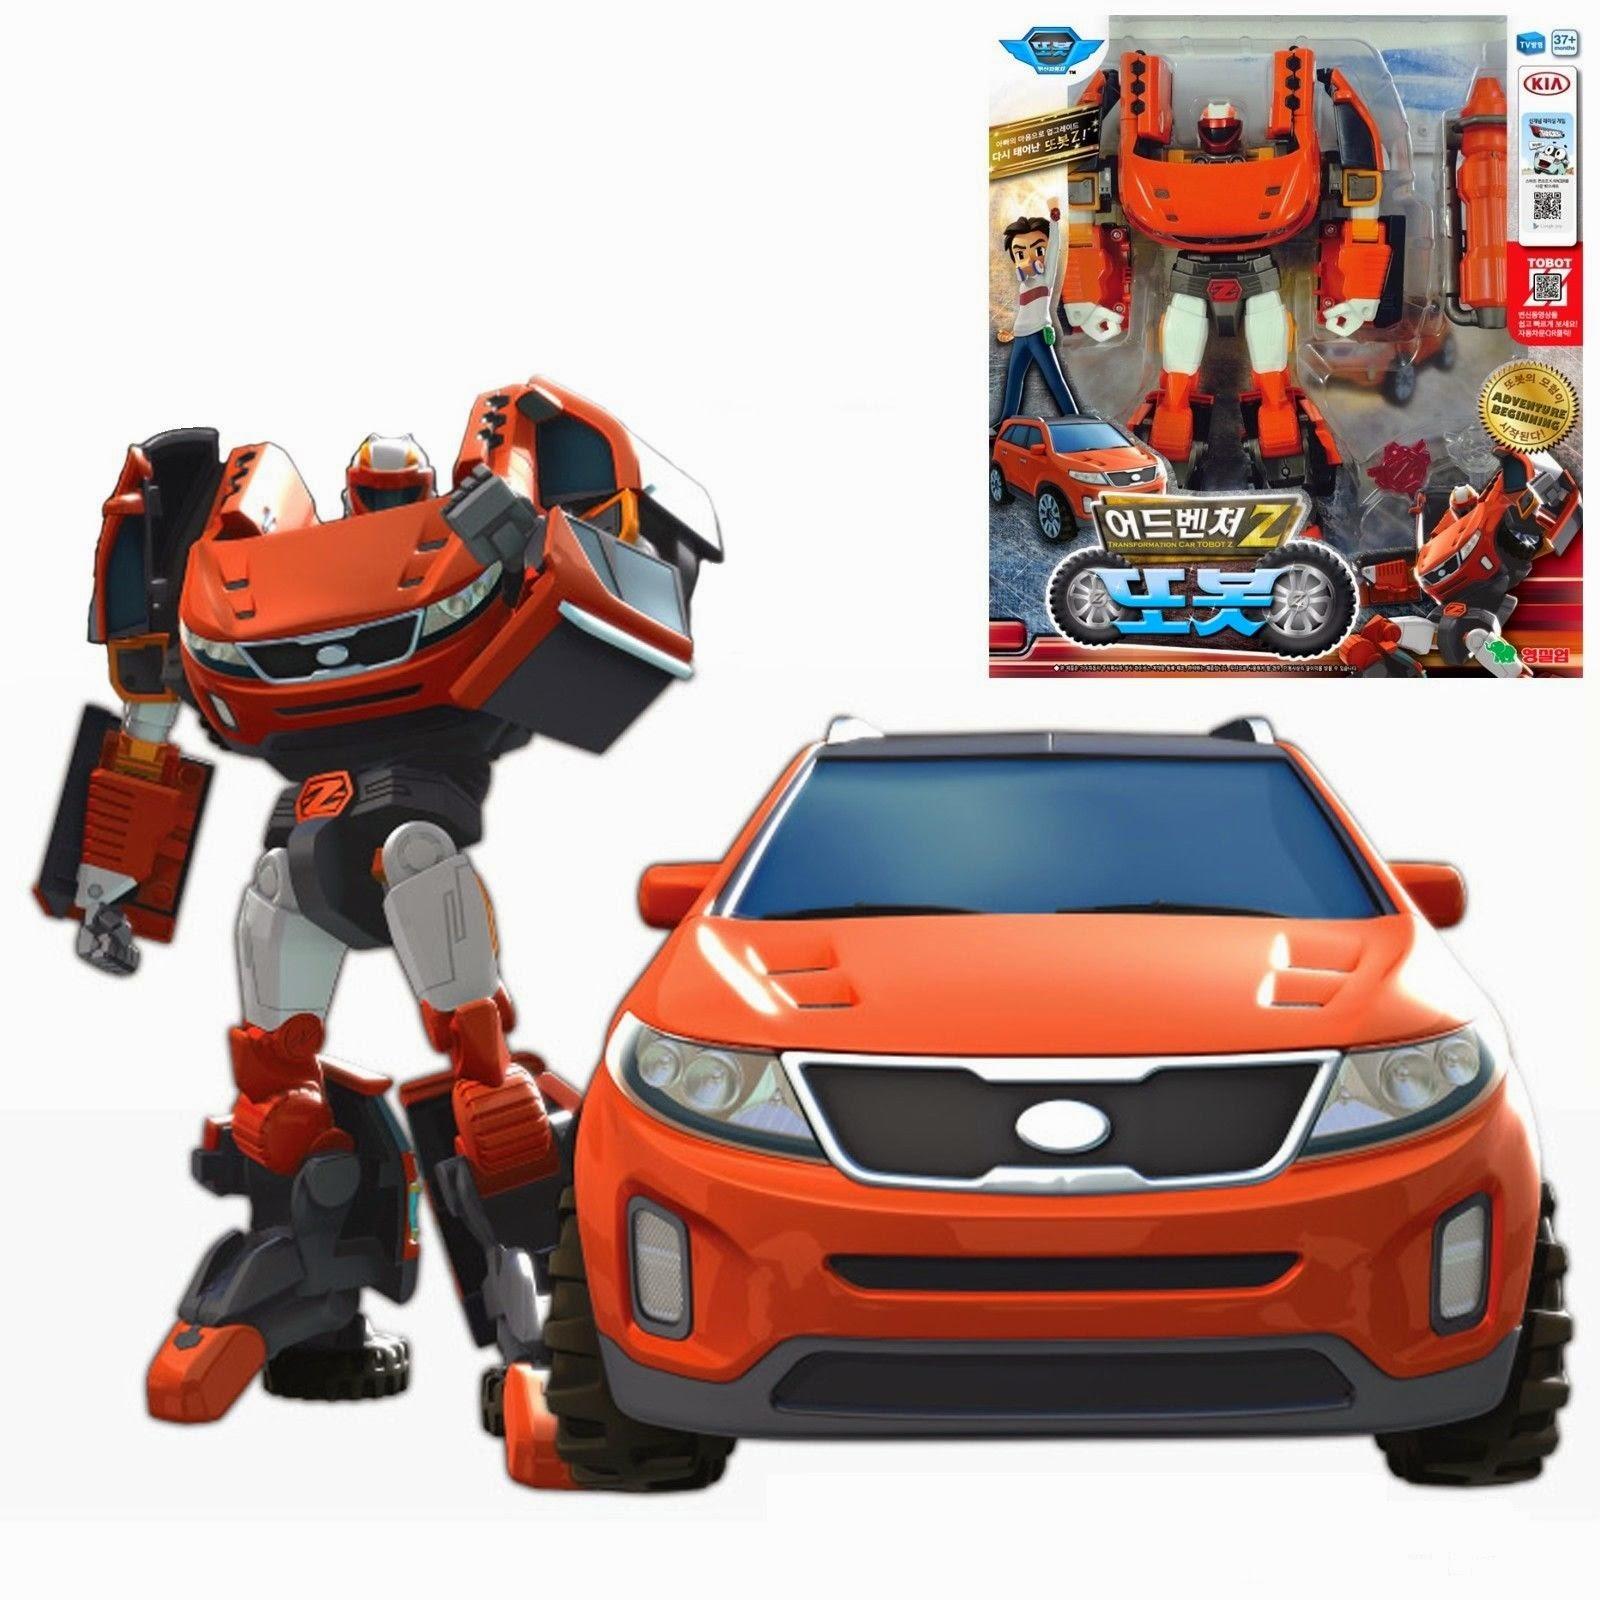 Tobot Y Car